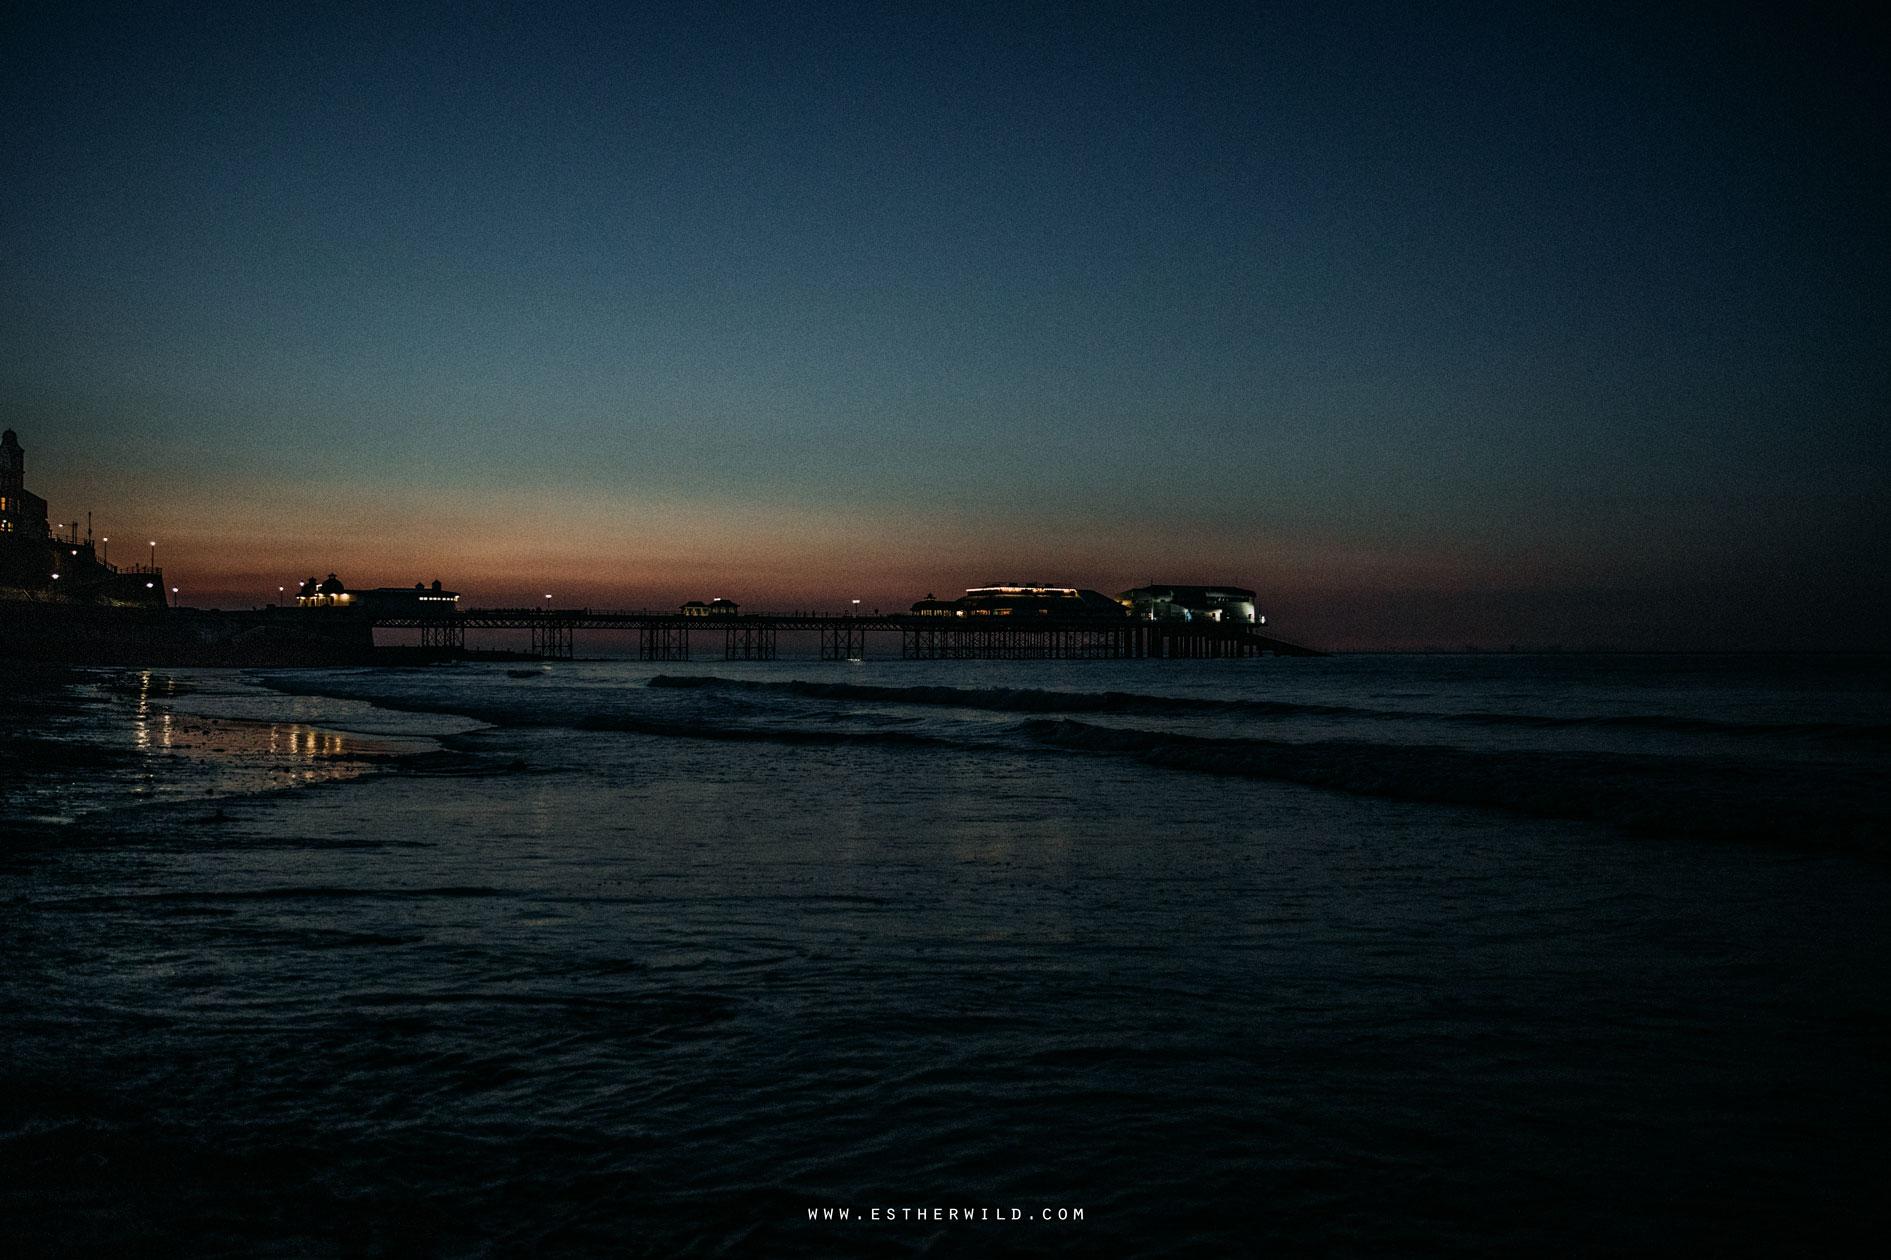 Cromer_Wedding_Beach_Outdoor_Ceremony_Norfolk_North_Lodge_Registry_Office_Rocket_House_Cafe_Cromer_Pier_IMG_5412.jpg